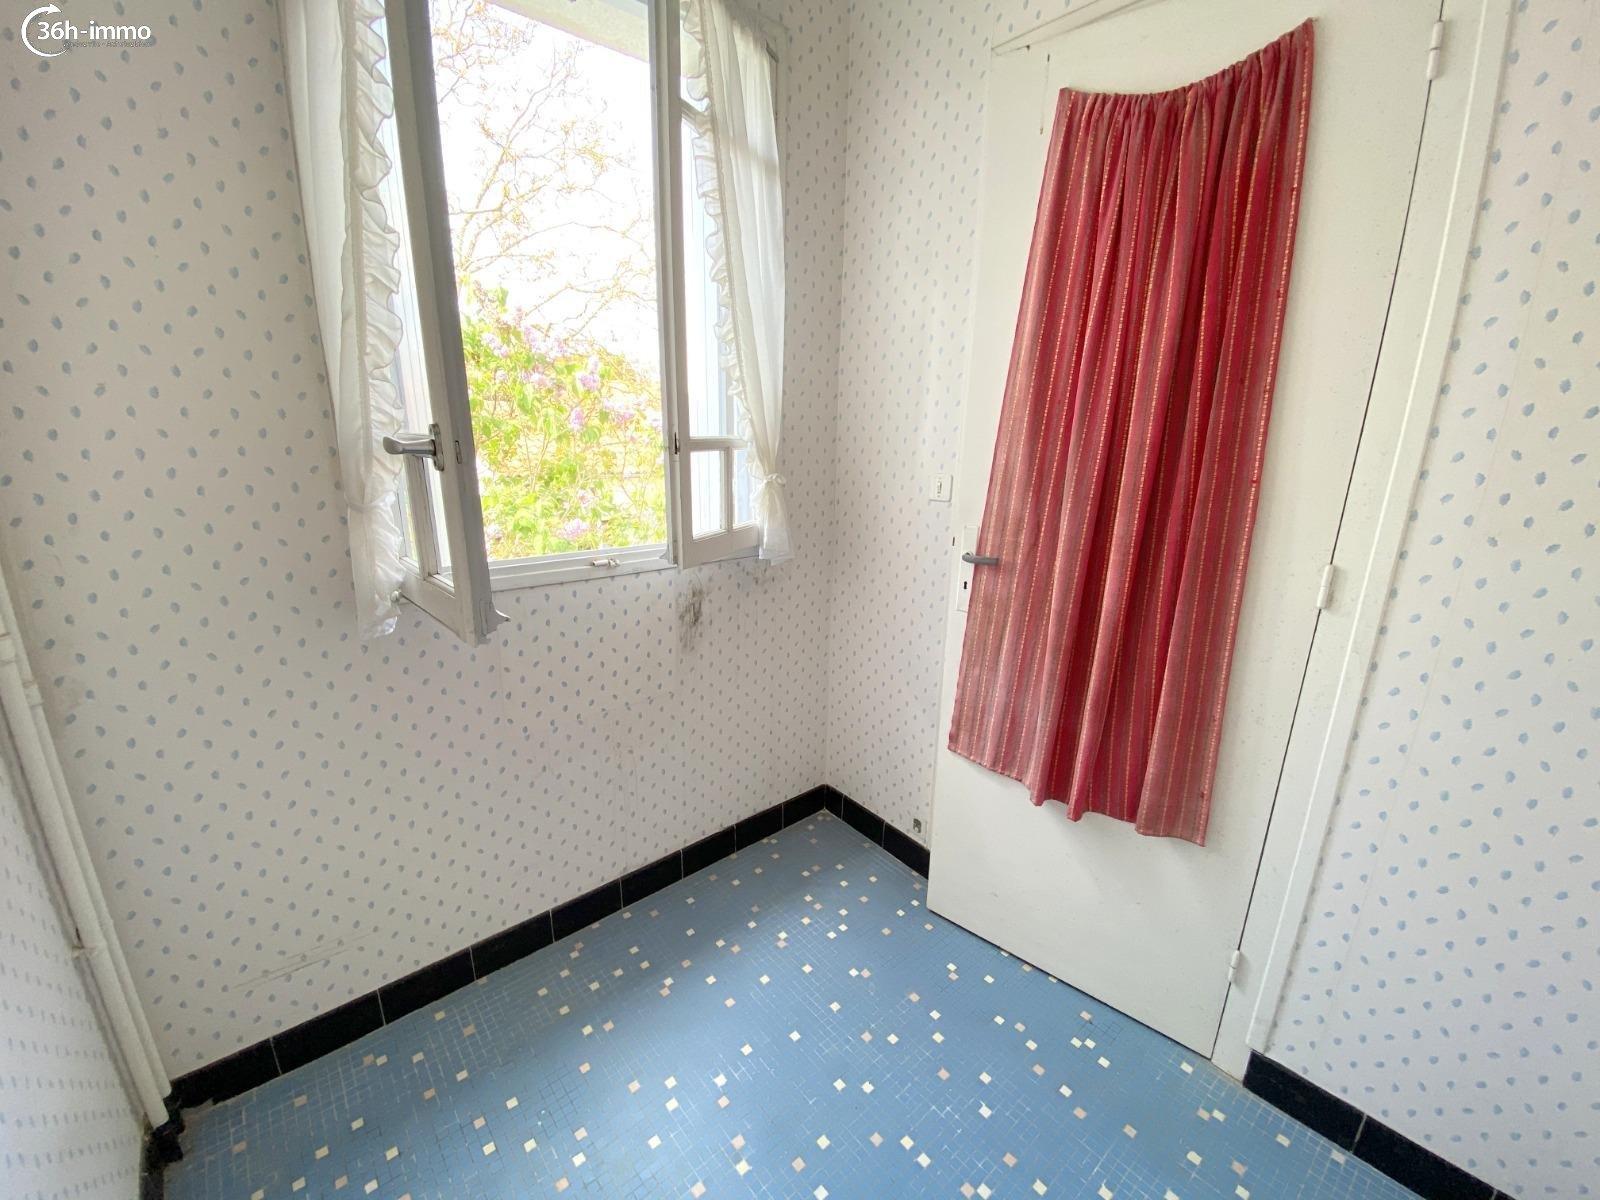 Maison Meschers-sur-Gironde 17132 Charente-Maritime 112 m<sup>2</sup> 7 pi&eagrave;ces 180000 euros